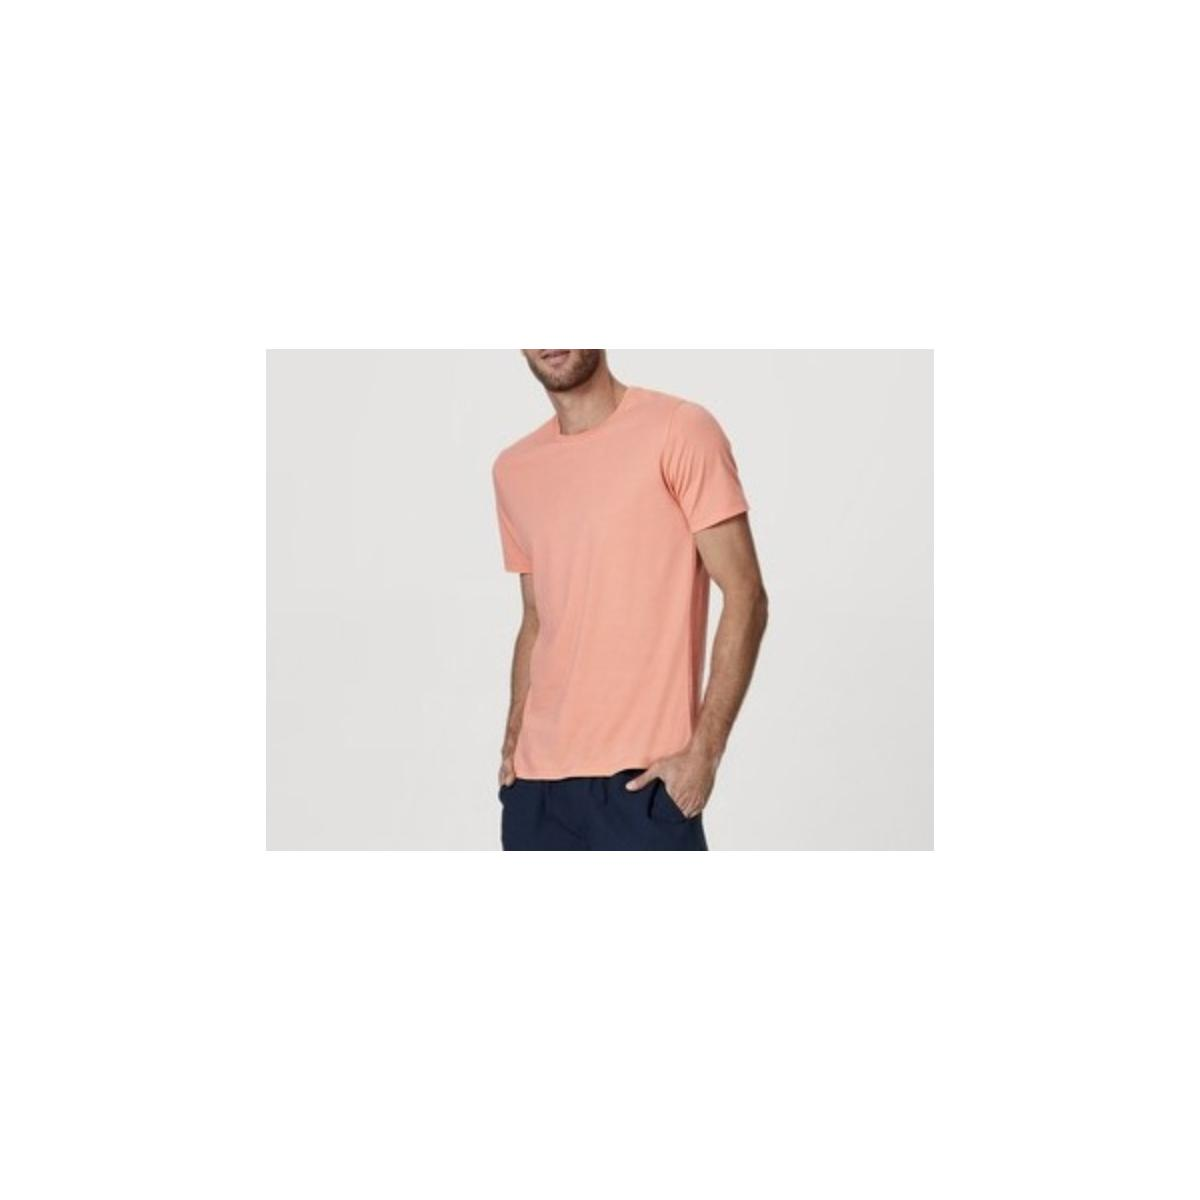 Camiseta Masculina Hering 0201 Llten Laranja